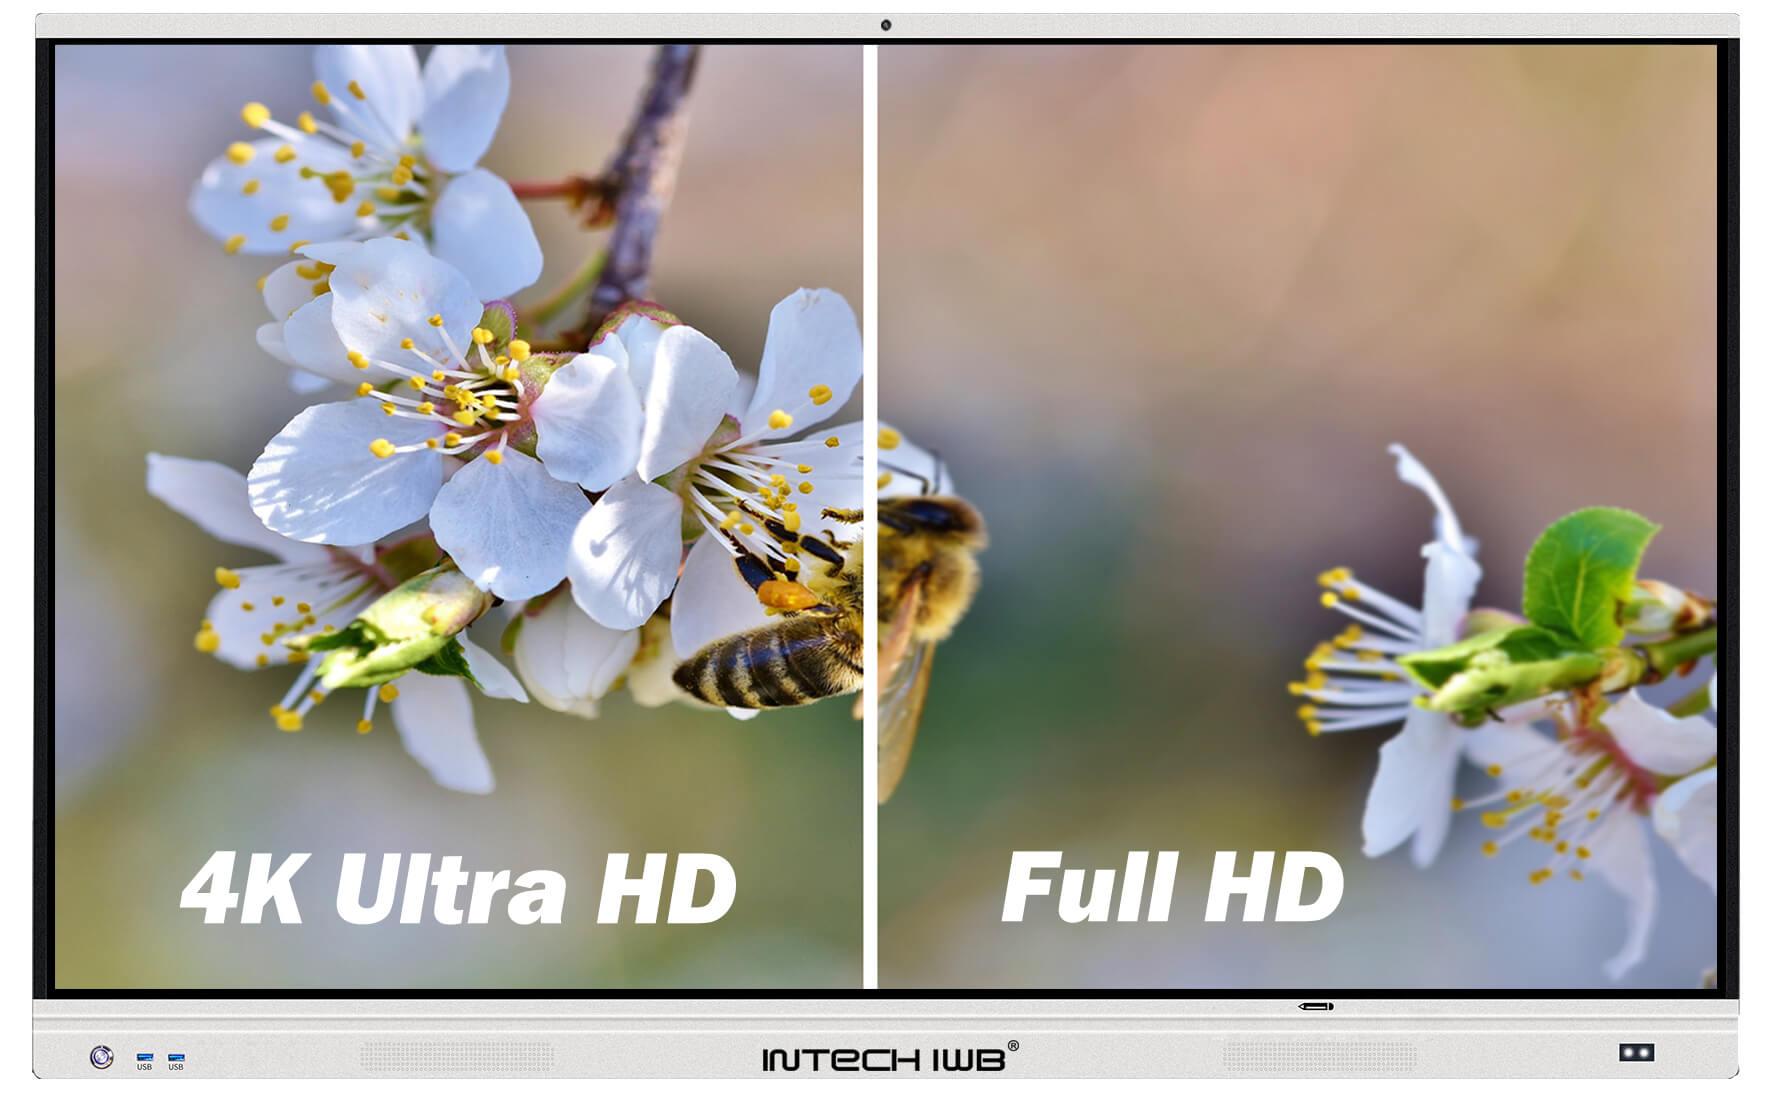 4K Ultra HD vs Full HD